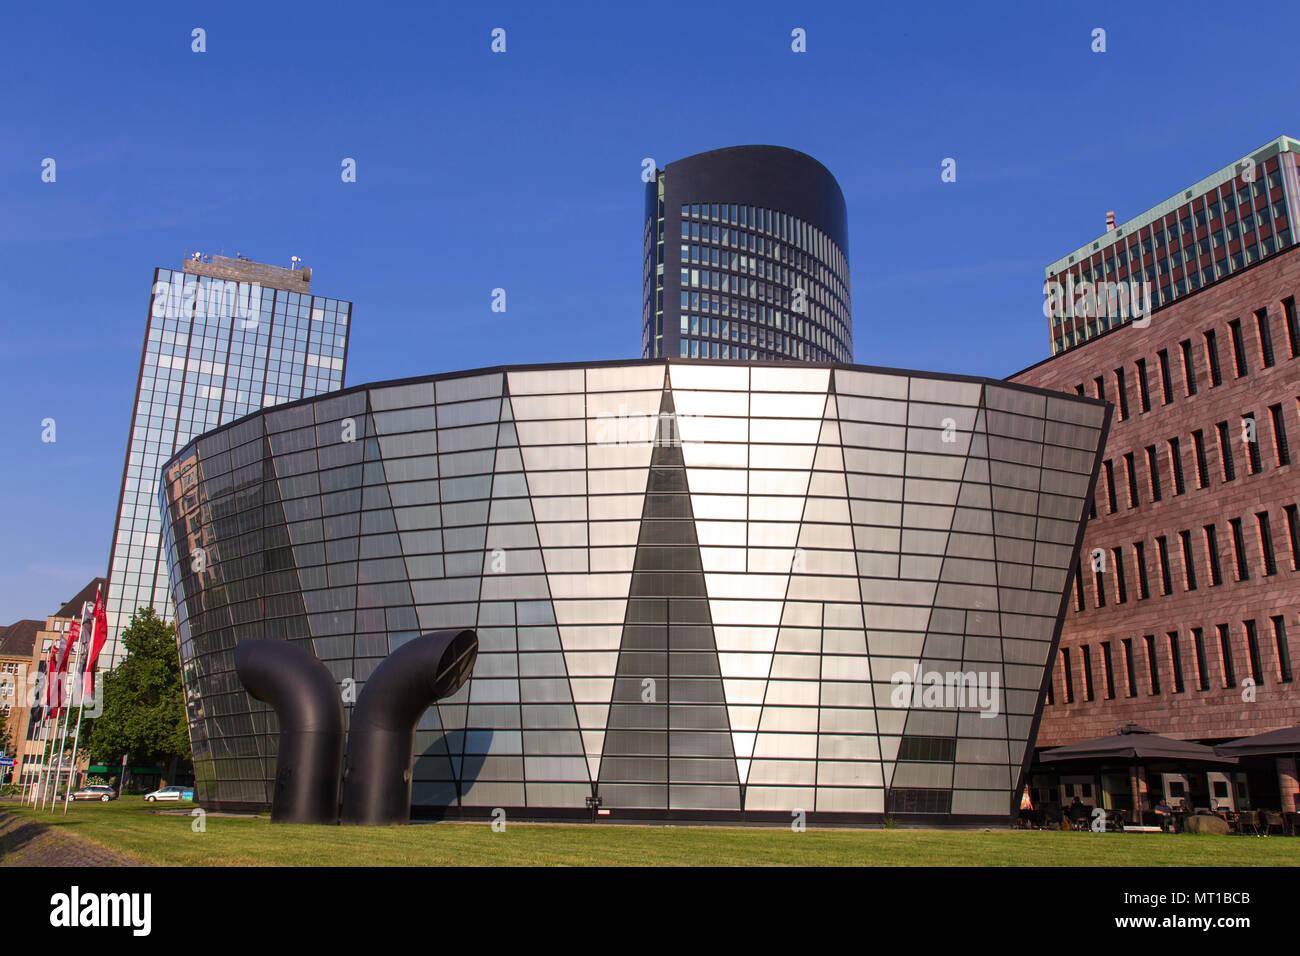 dortmund cityscape germany - Stock Image